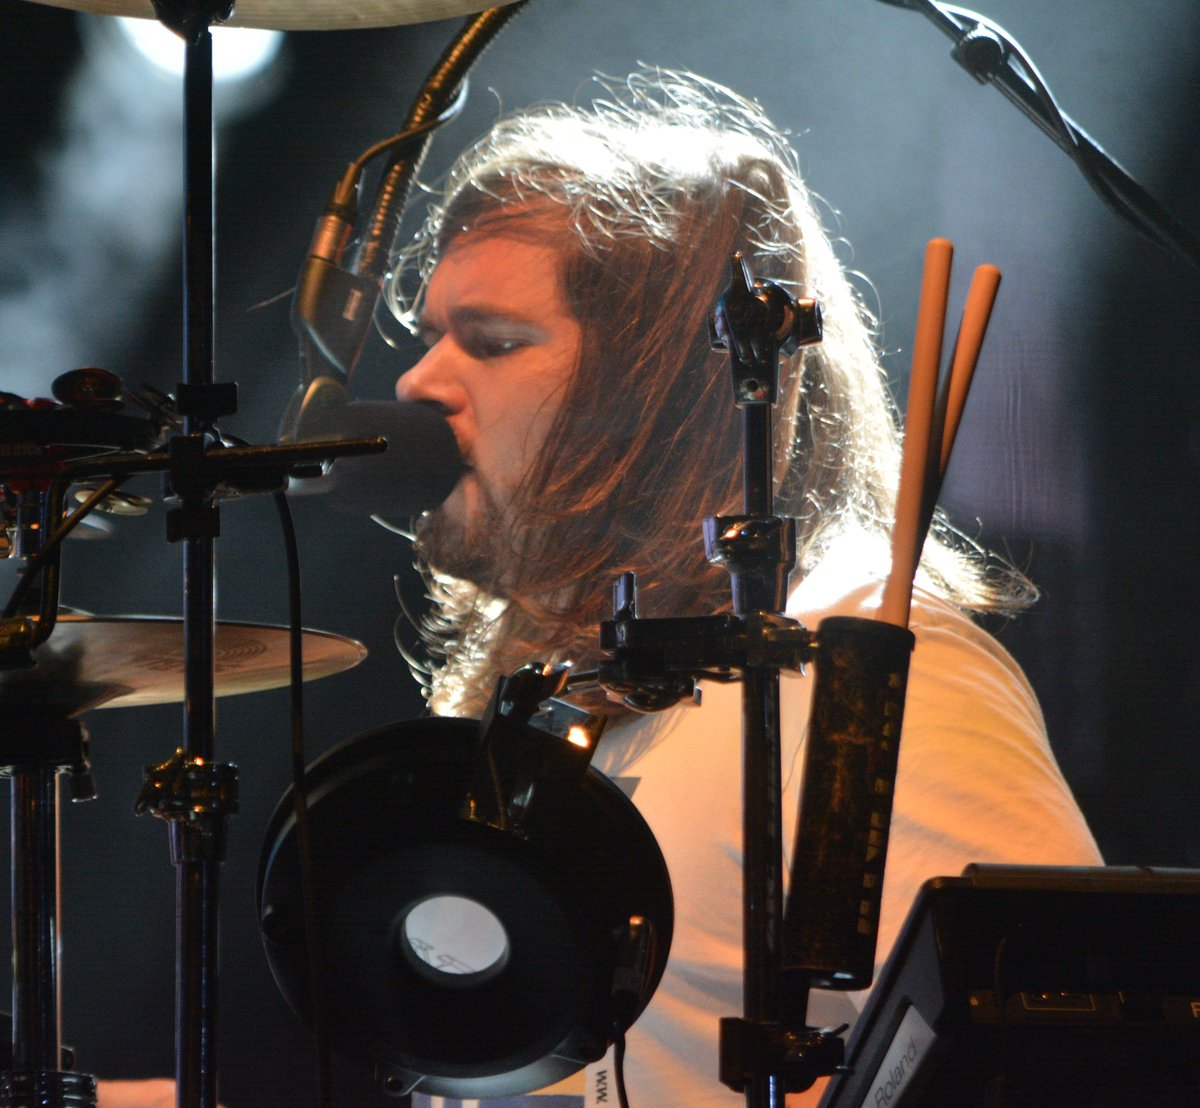 #qpm #quarterpastmidnight #badblood #survivin #wygd  #bastille #NOLA #NOLATwitter #rock #love #Saints #CFBPlayoff #doomdays #singer  #drummer #uk #USA  #dansmith #ajordanphotography